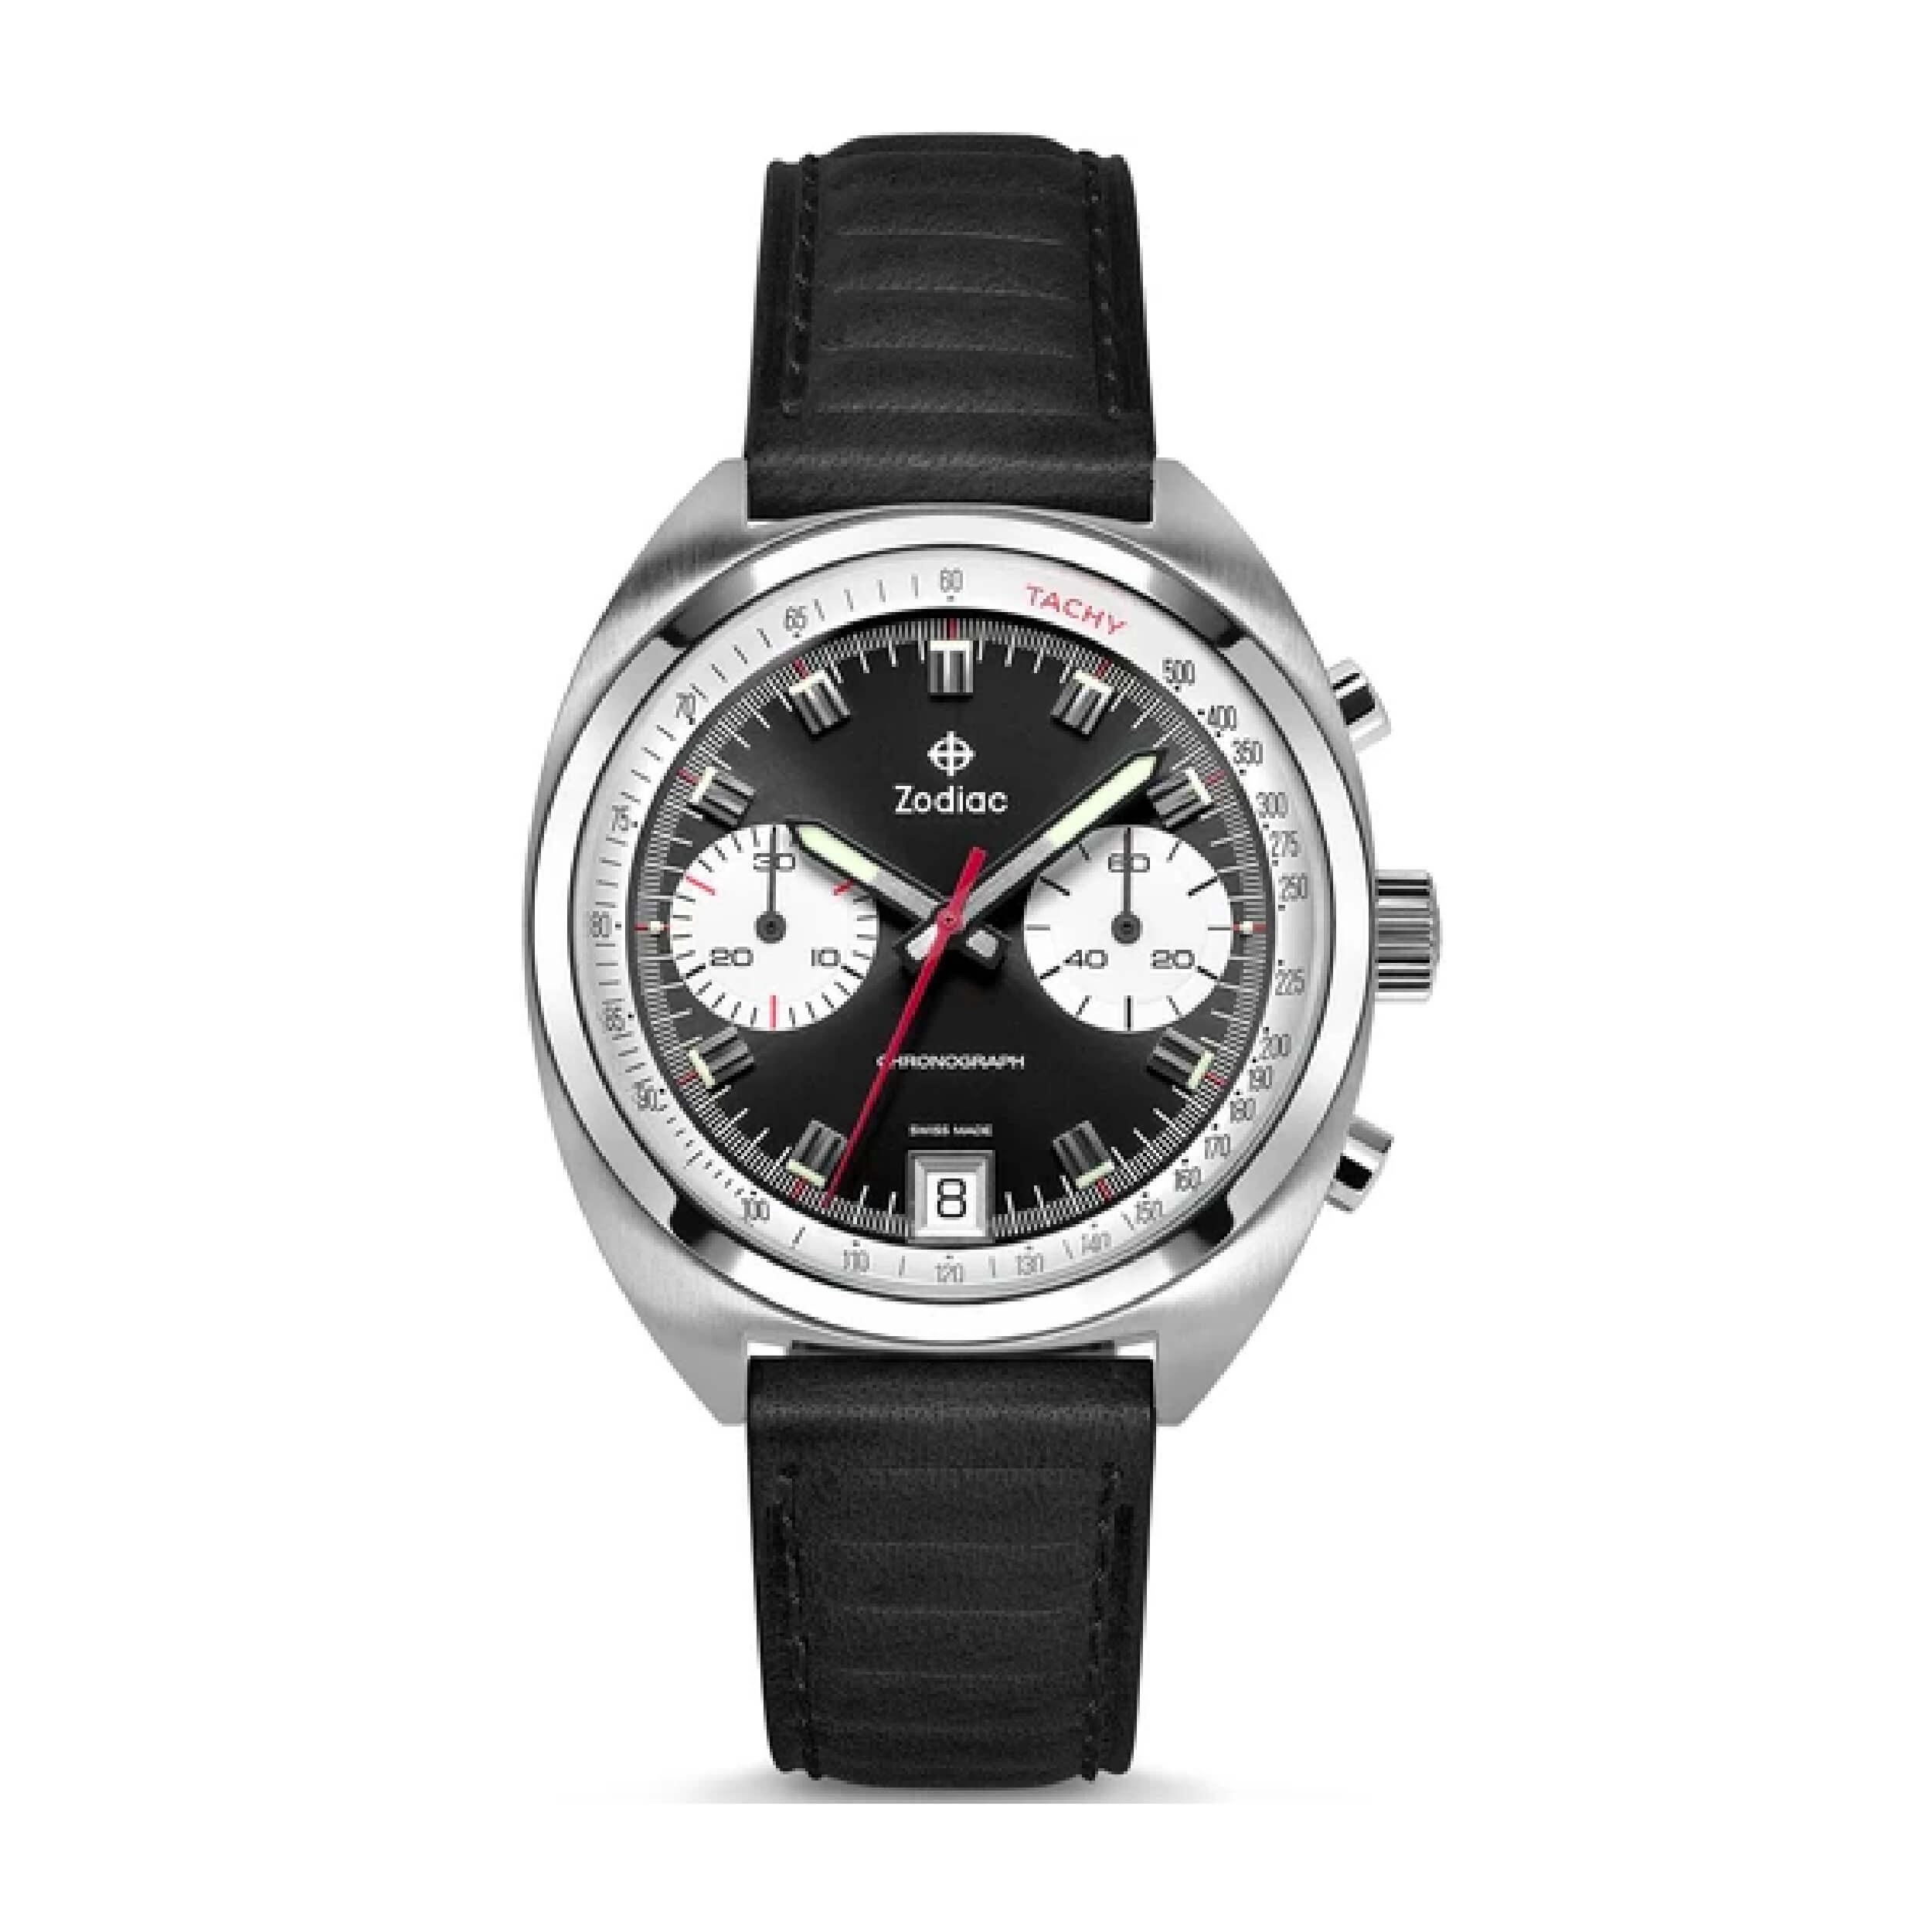 Zodiac Grandrally | Best Chronograph Watch Under £500